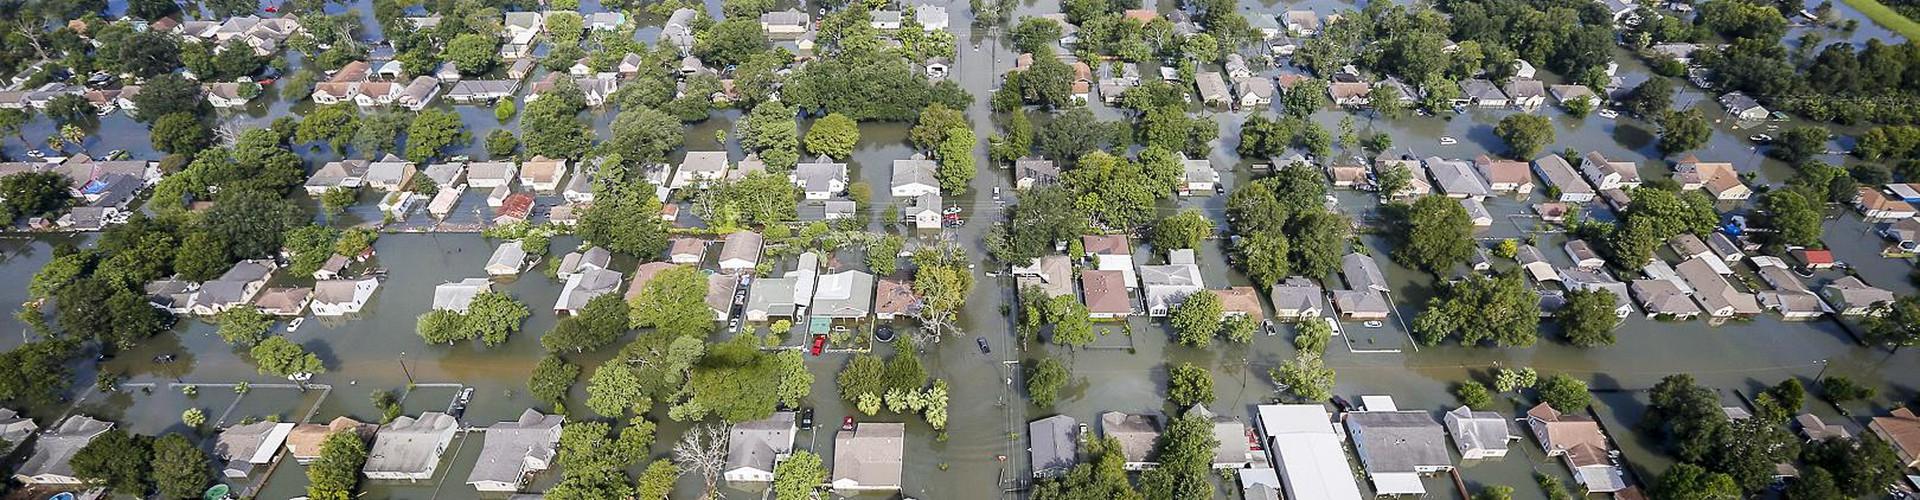 Harvey flooding, southeast Texas (Credit: Air National Guard photo by Staff Sgt. Daniel J. Martinez)